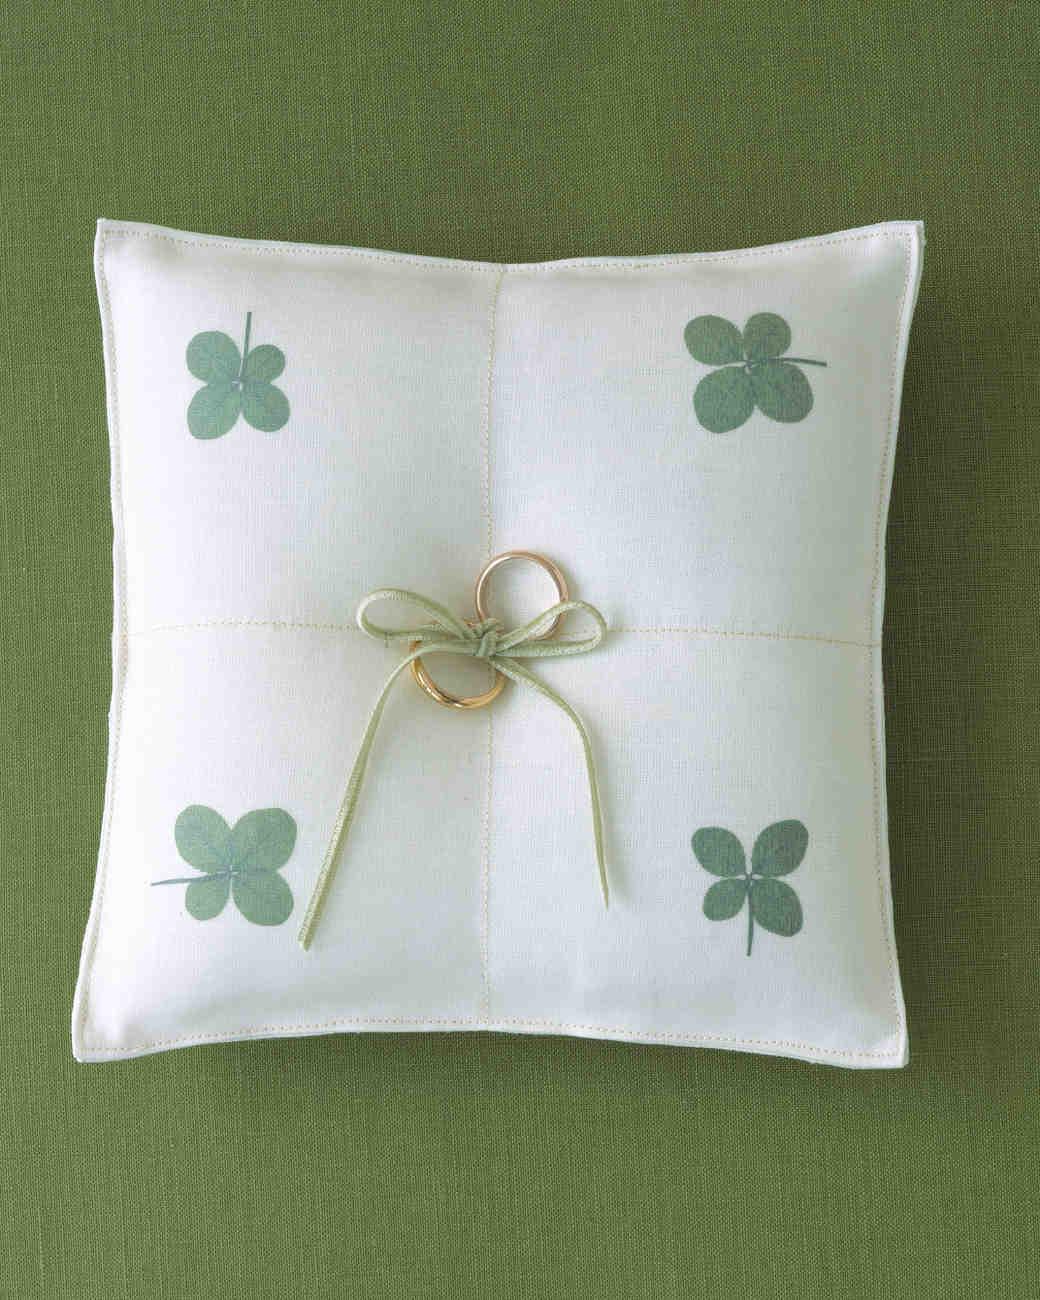 diy-ring-pillows-a99035-clover-0515.jpg